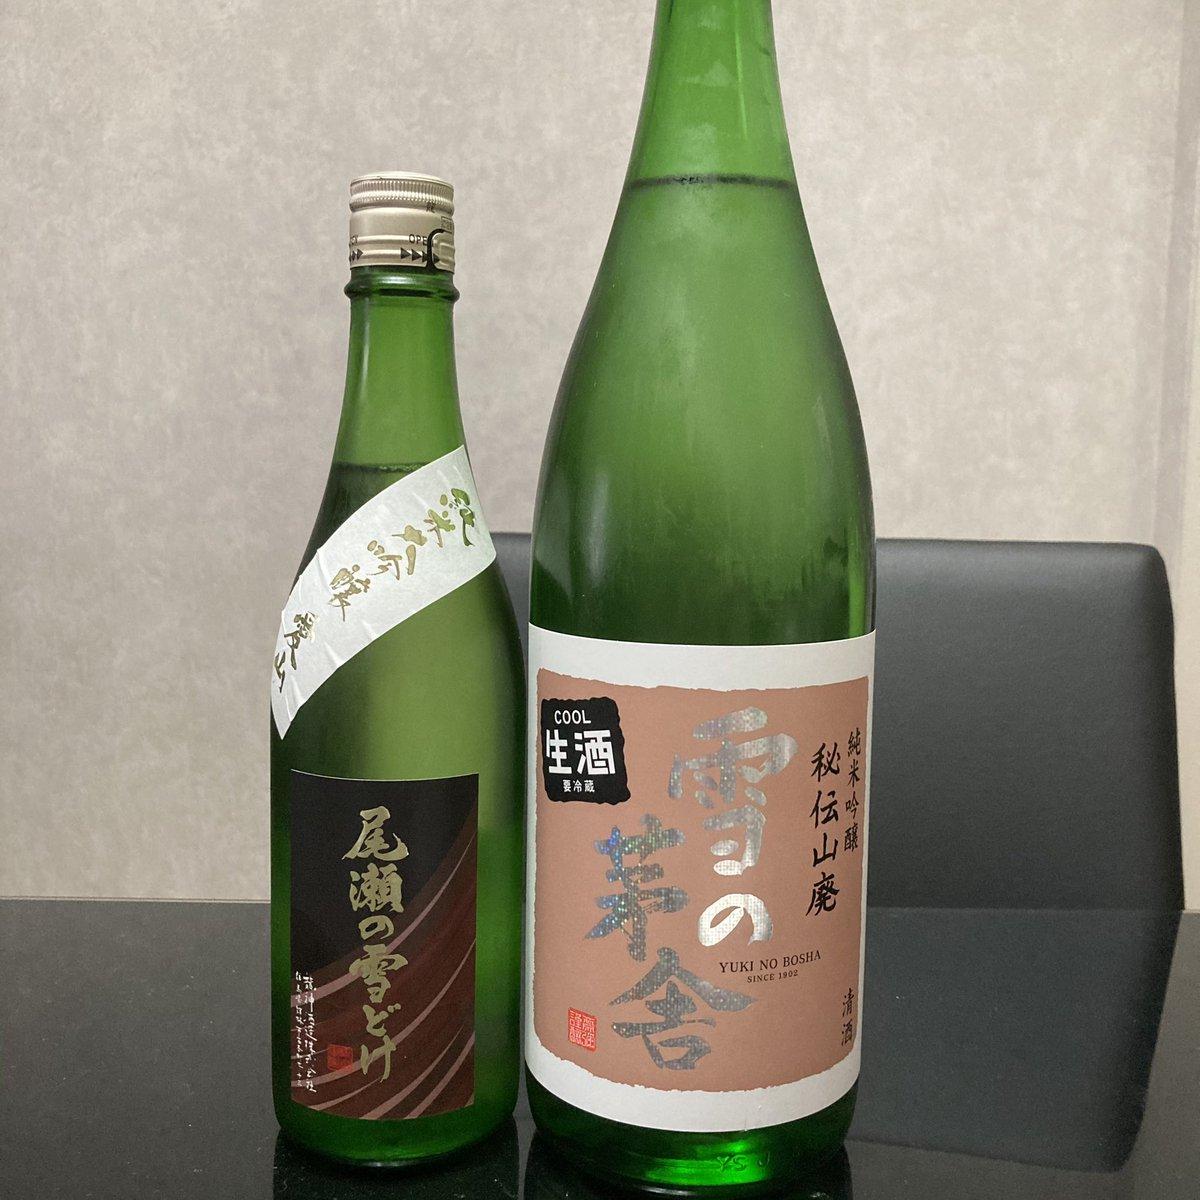 test ツイッターメディア - 先日仕入れた日本酒たち。  今年最後の「雪の茅舎」の山廃 尾瀬の雪どけ愛山 https://t.co/Zv1el35n2S